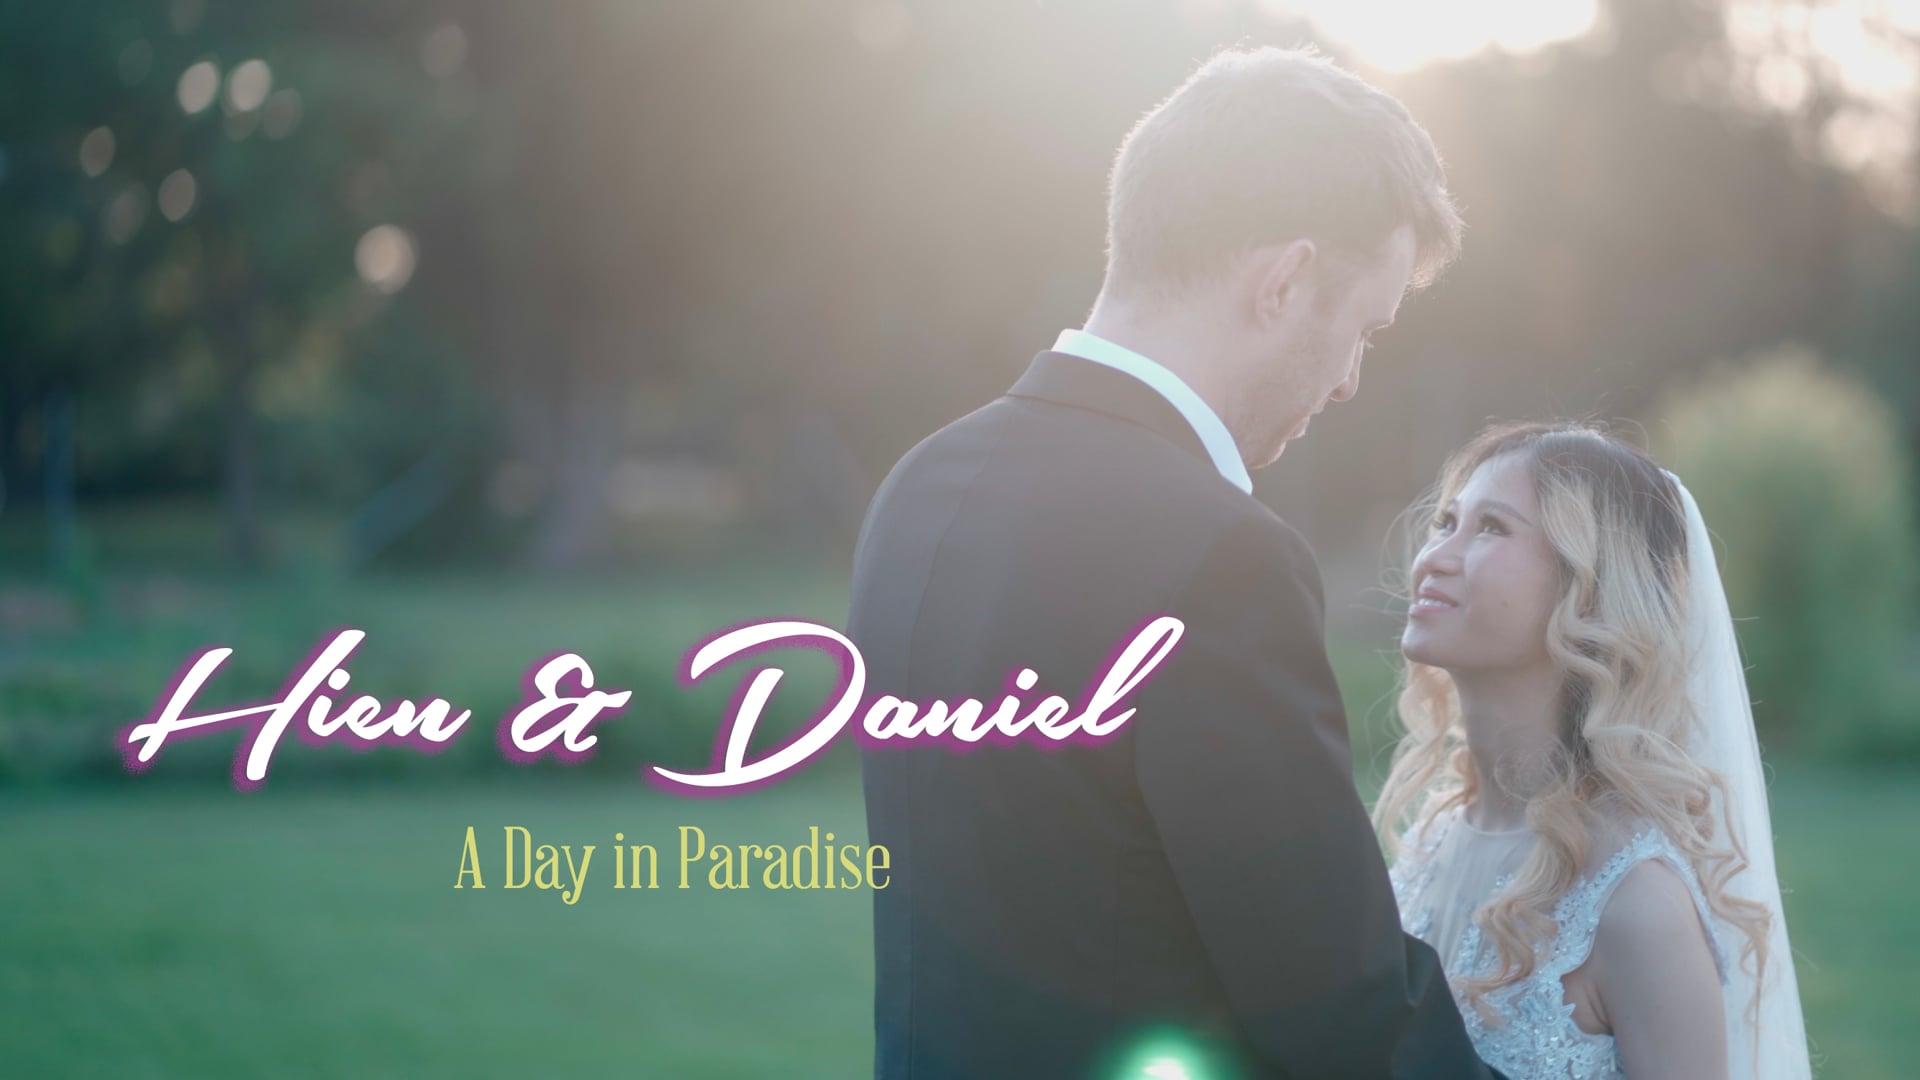 Hien & Daniel - A Day in Paradise